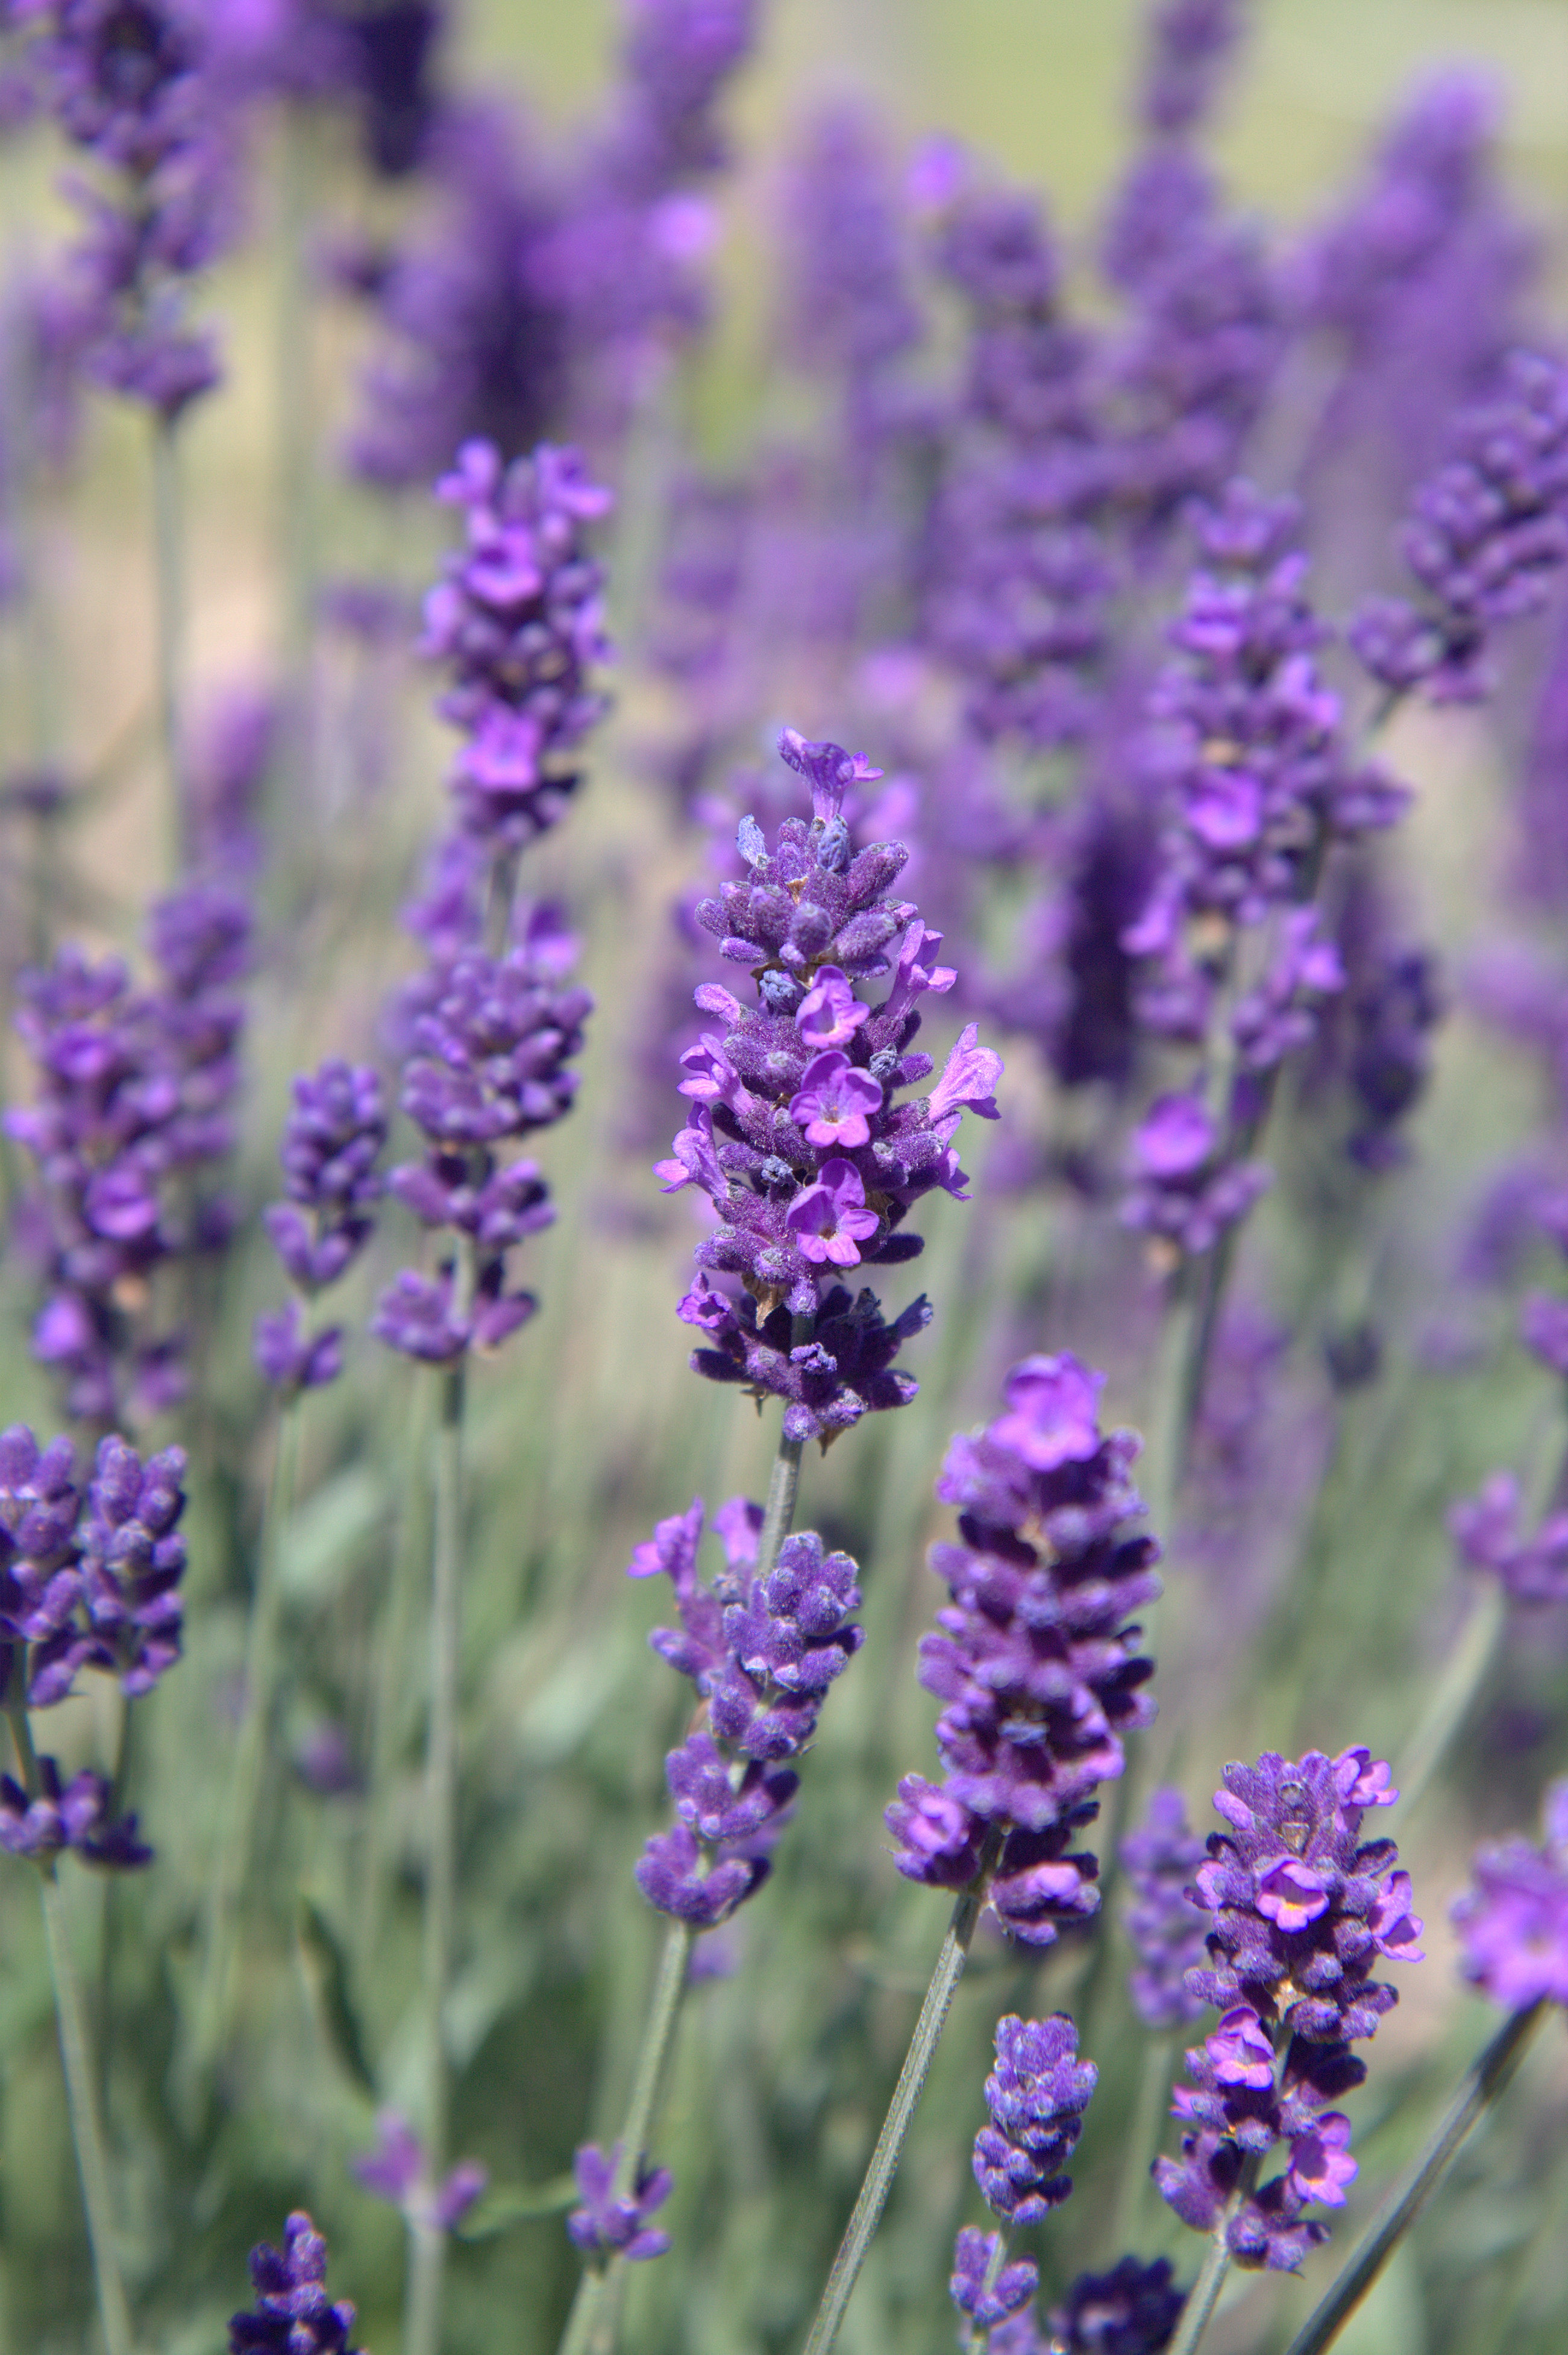 Wholesale Lavender Plants - Fairweather's Nursery